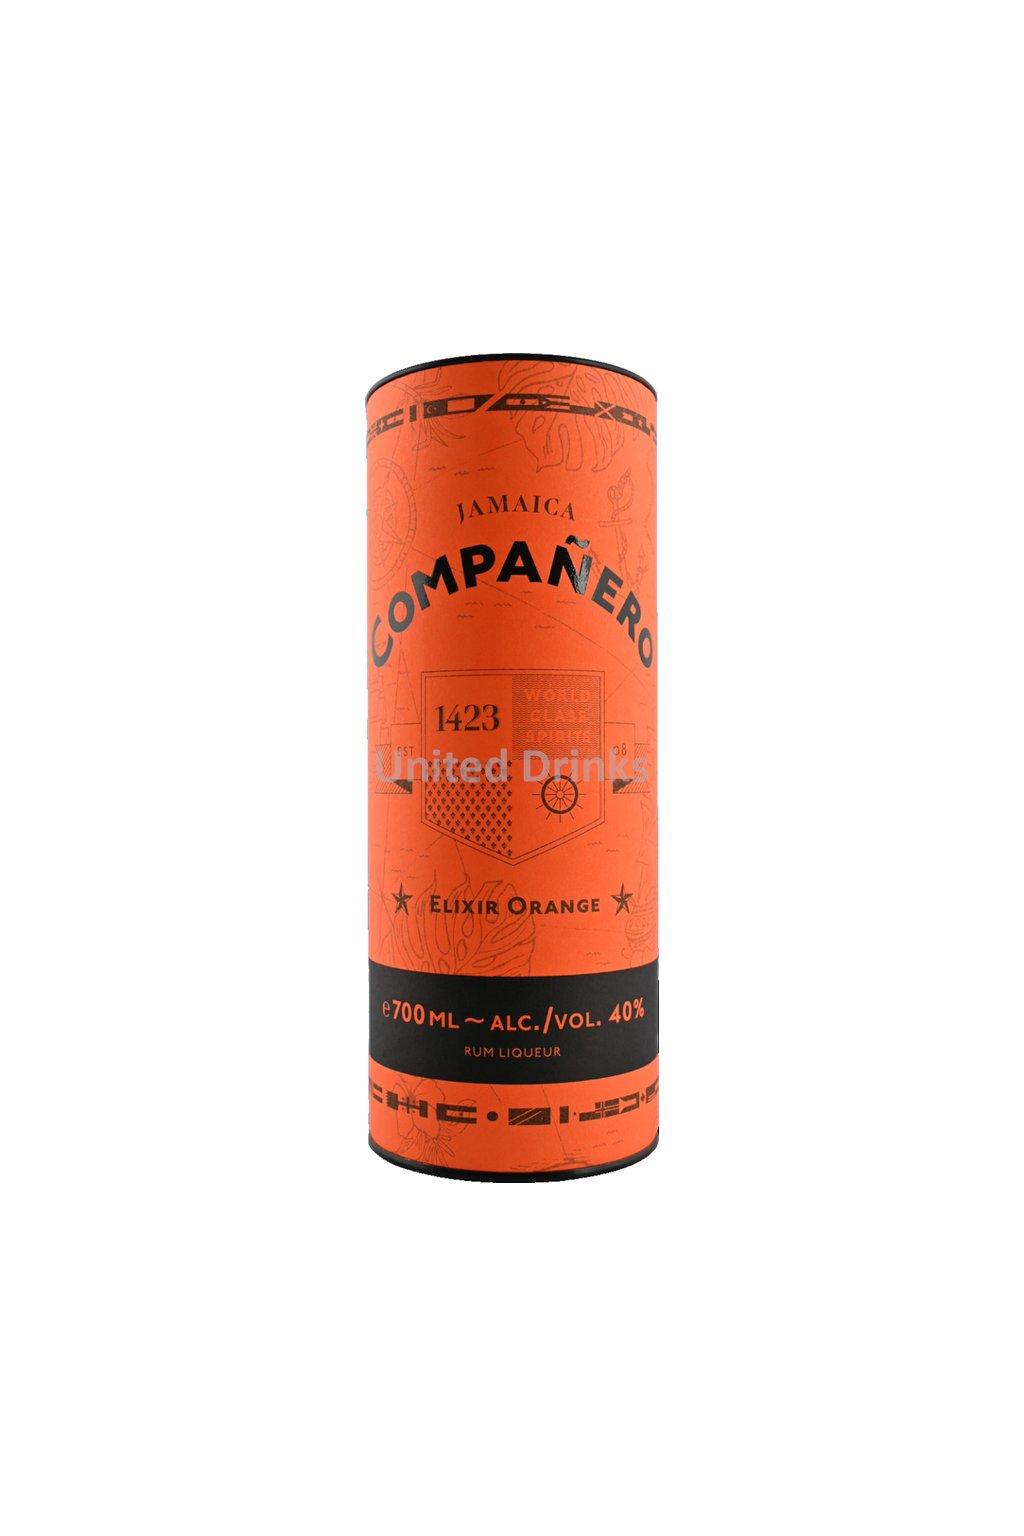 Ron Companero Elixir Orange GB